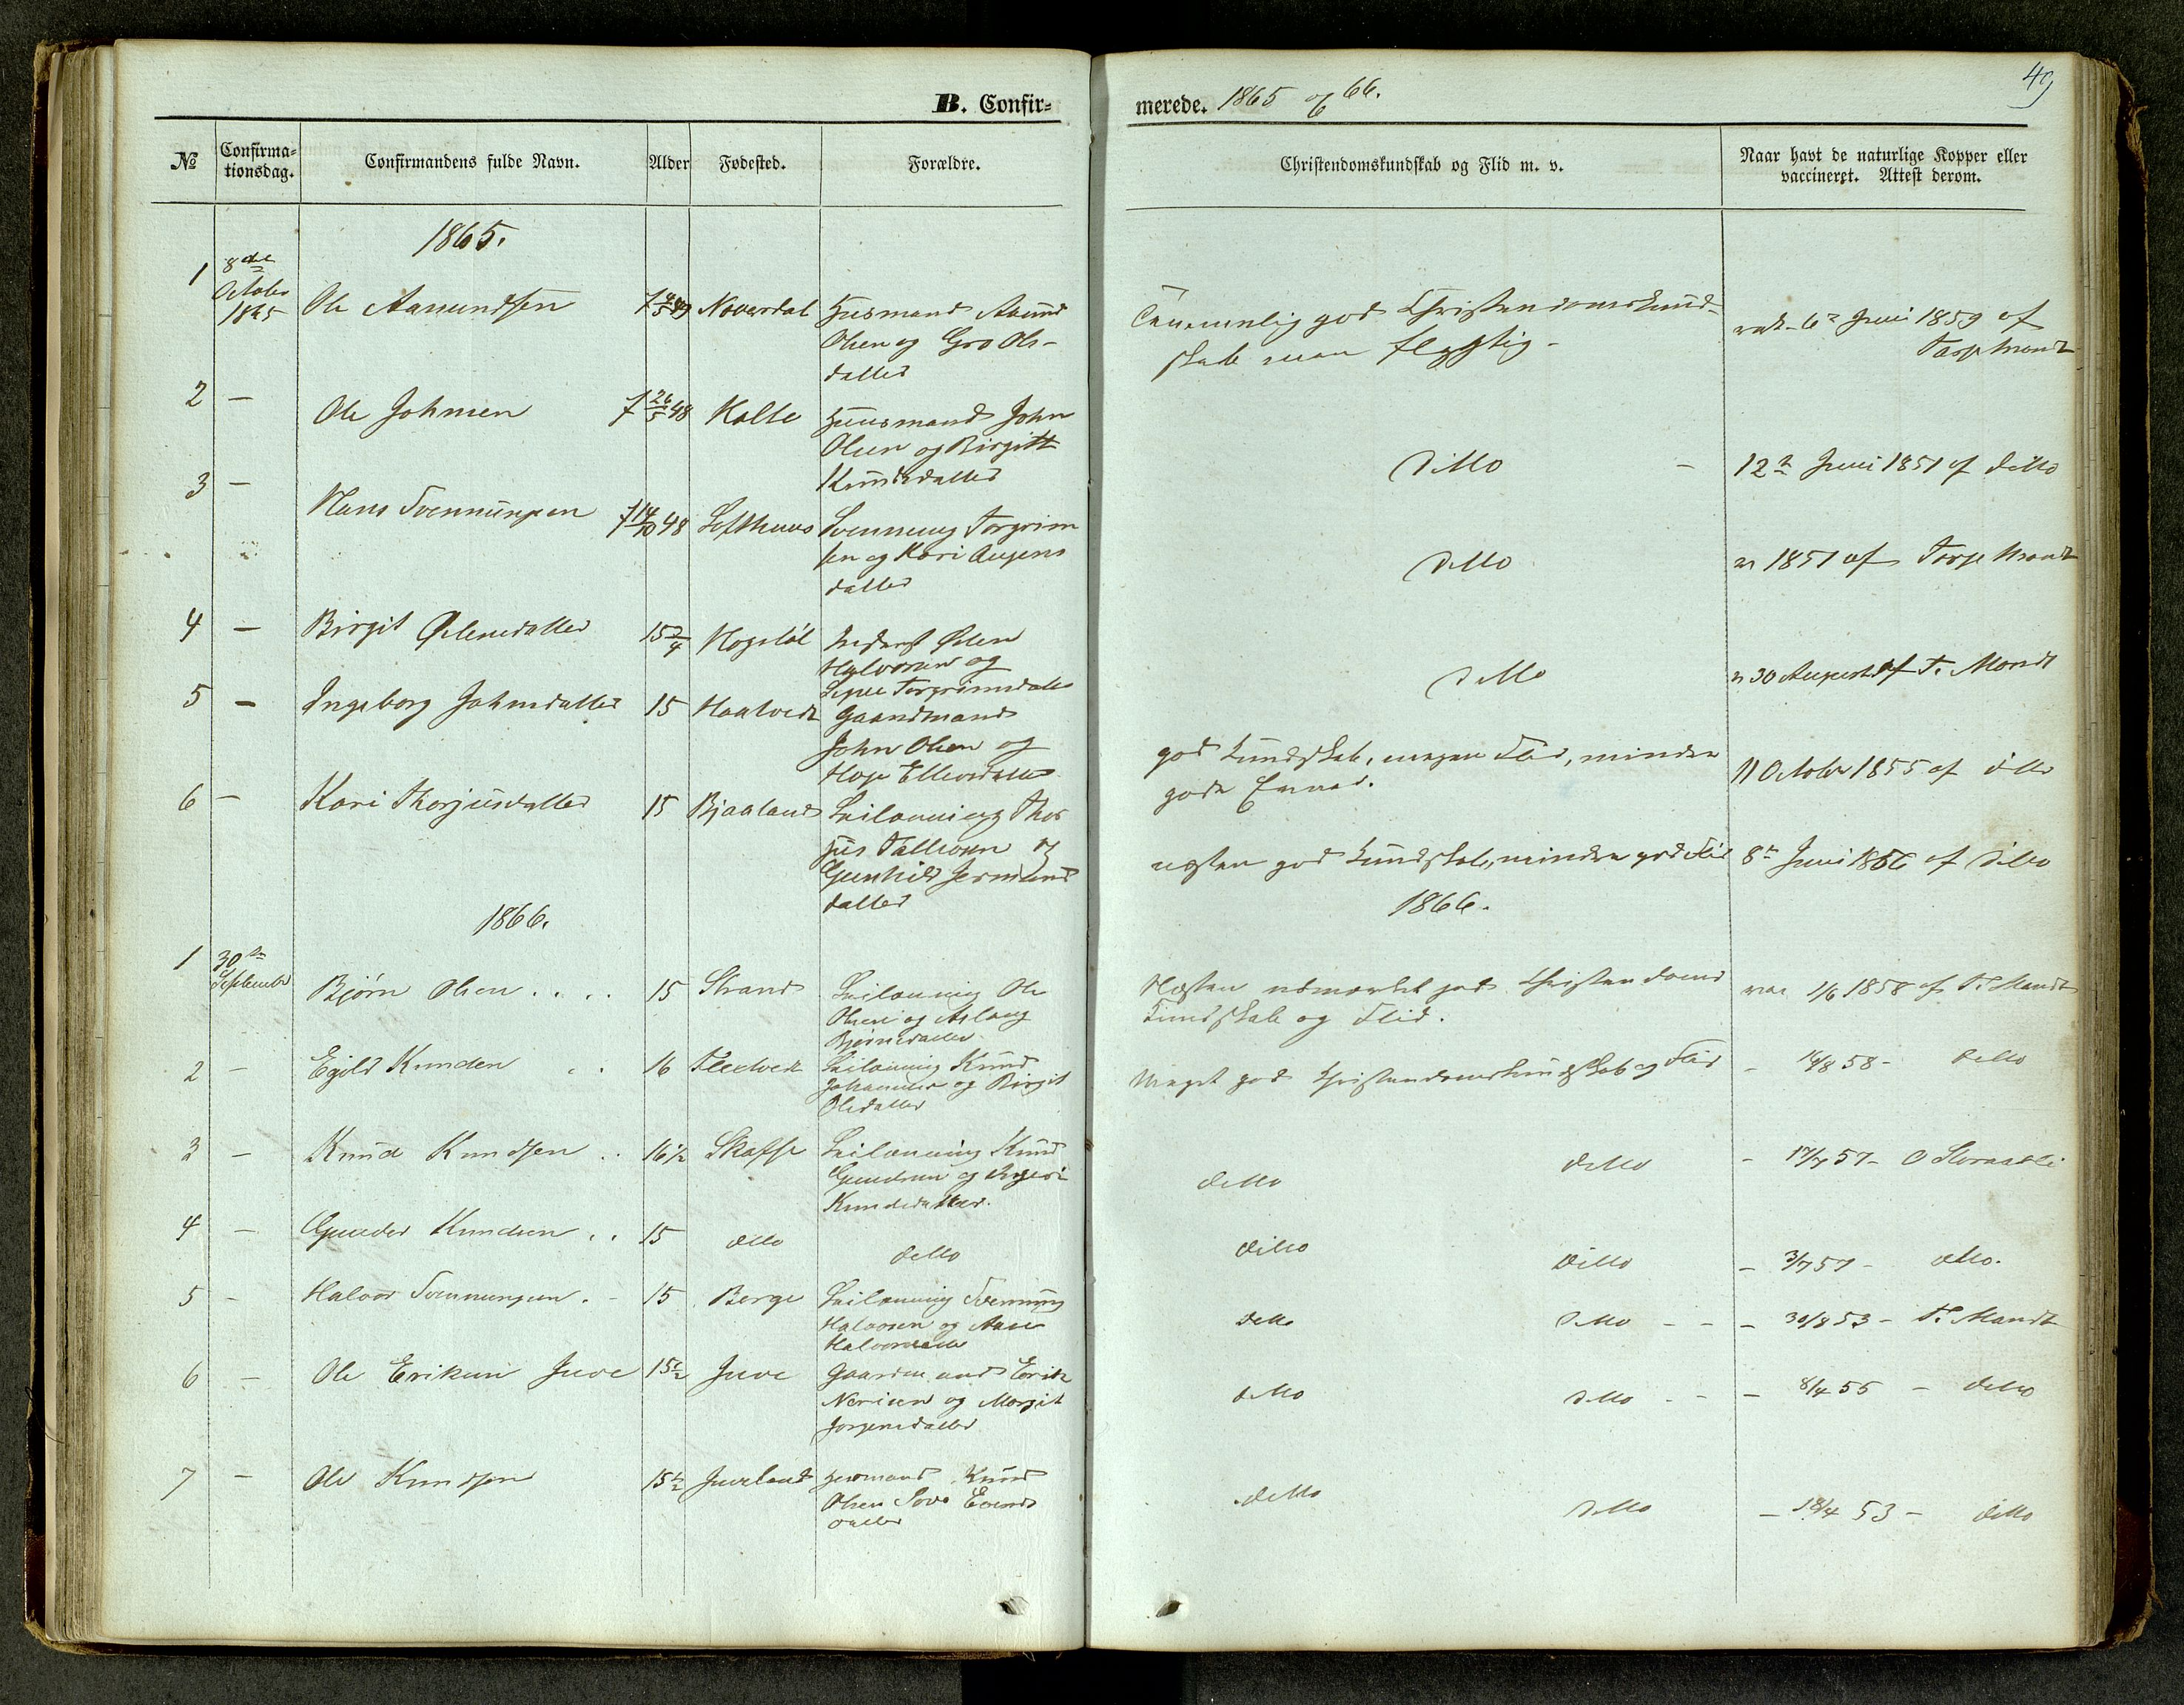 SAKO, Lårdal kirkebøker, G/Ga/L0002: Klokkerbok nr. I 2, 1861-1890, s. 49